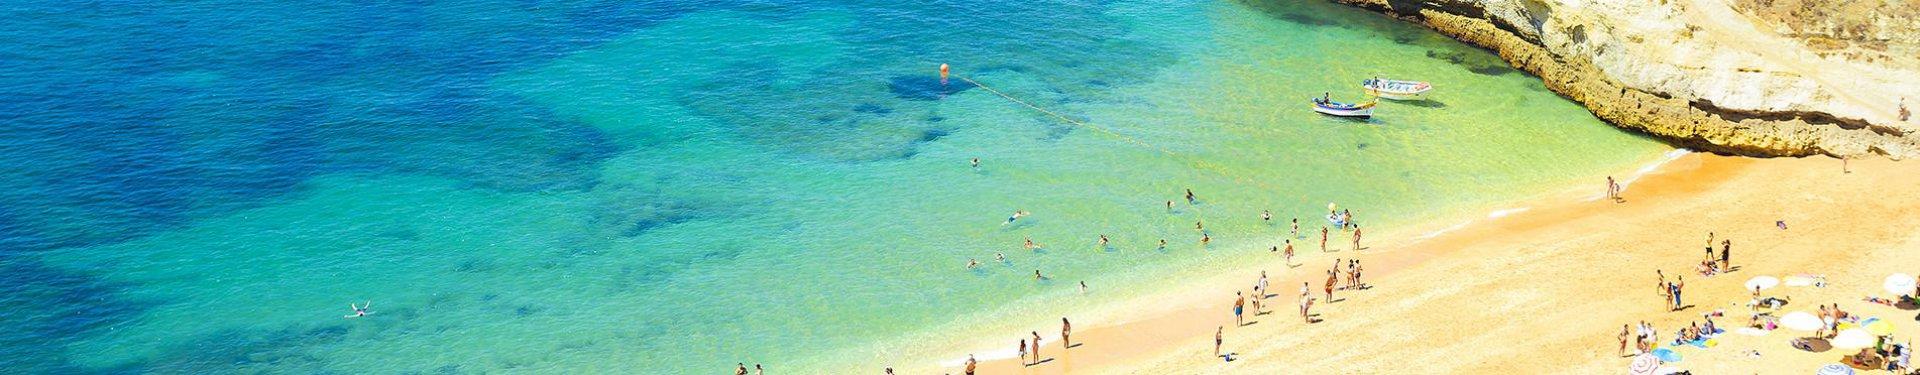 Villas In Portugal Clickstay Holiday Rentals